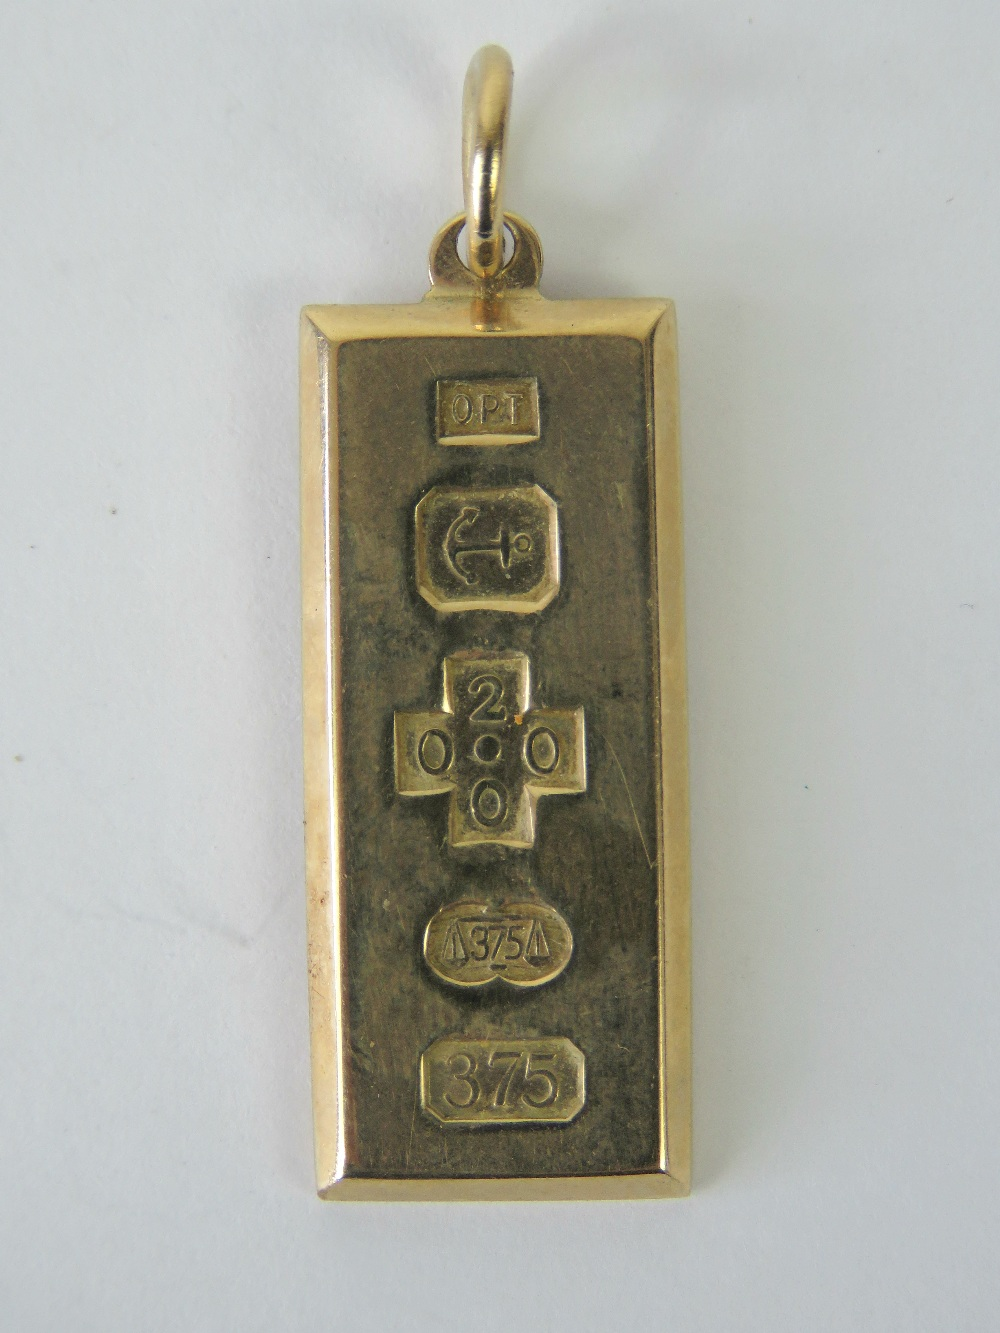 Lot 113 - A 9ct gold ingot pendant hallmarked Birmingham 2000, 4cm in length, 10.8g.